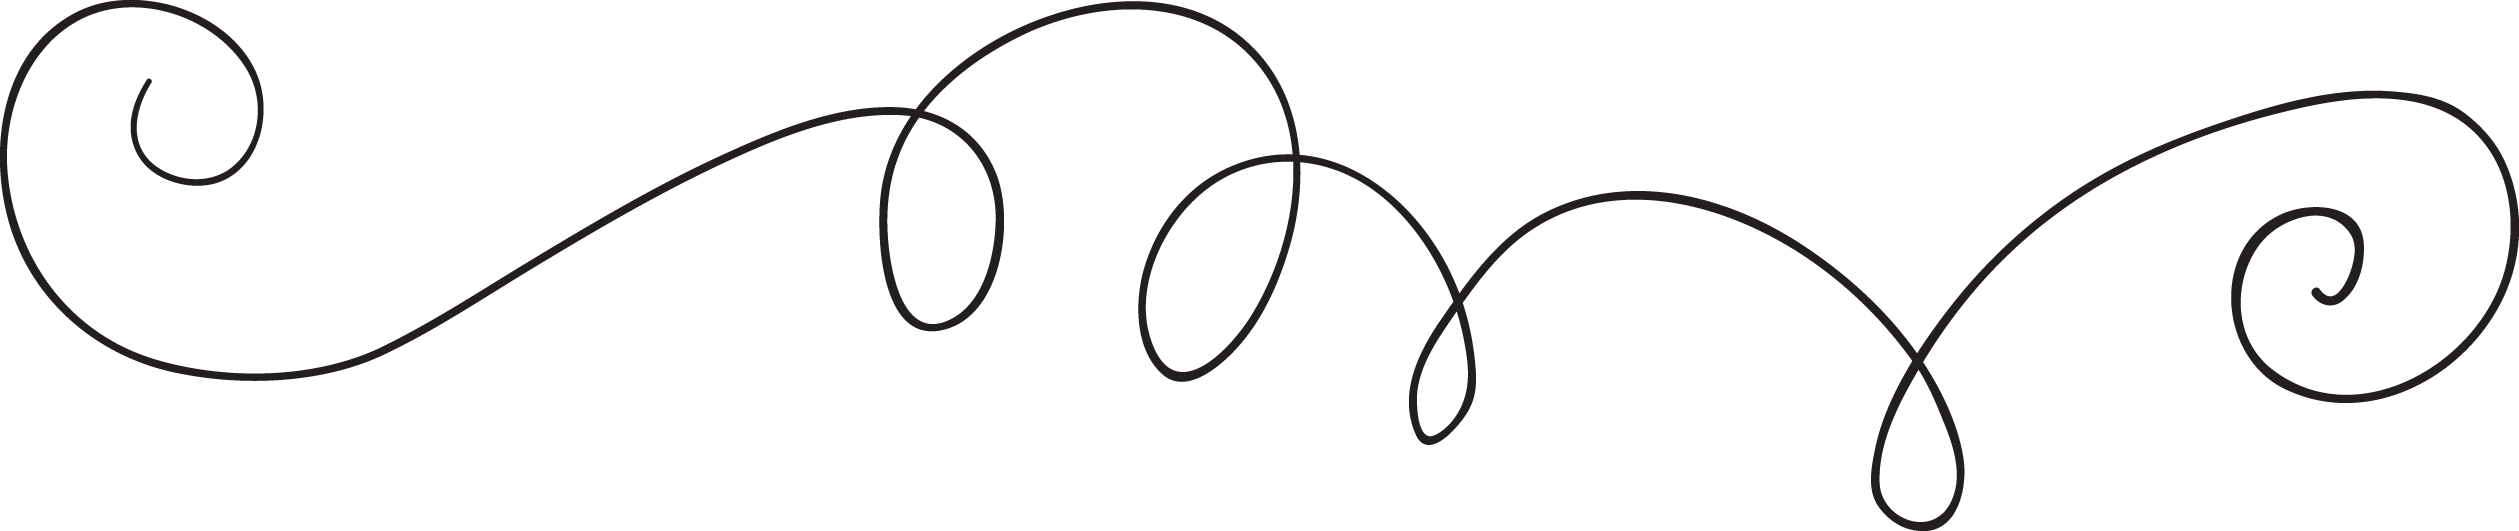 line-swirl